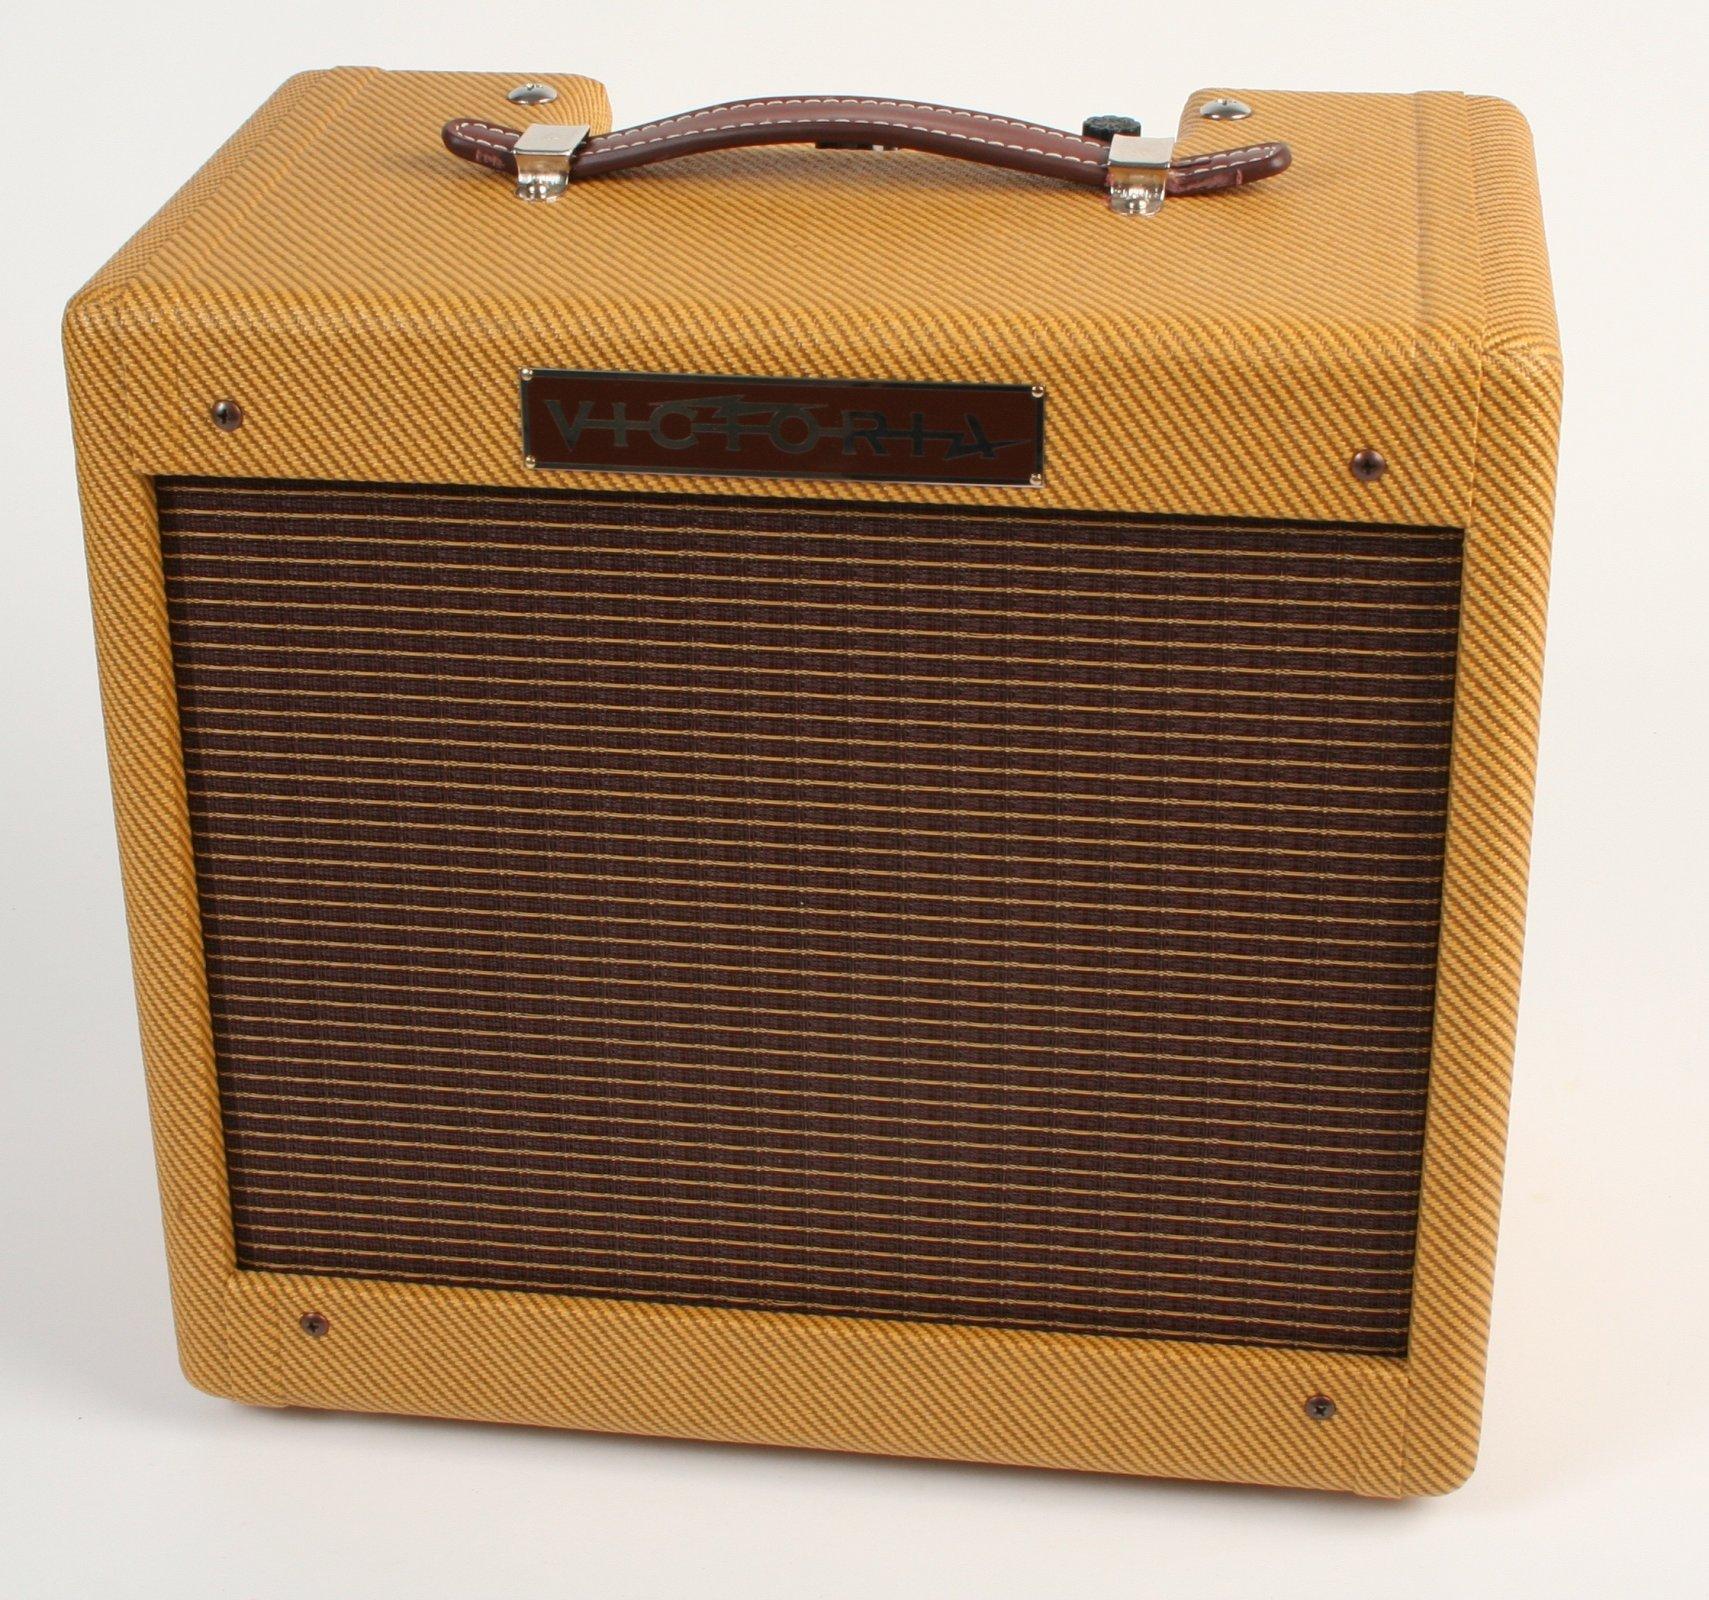 Victoria Amplifier Co 518 5F1 Style